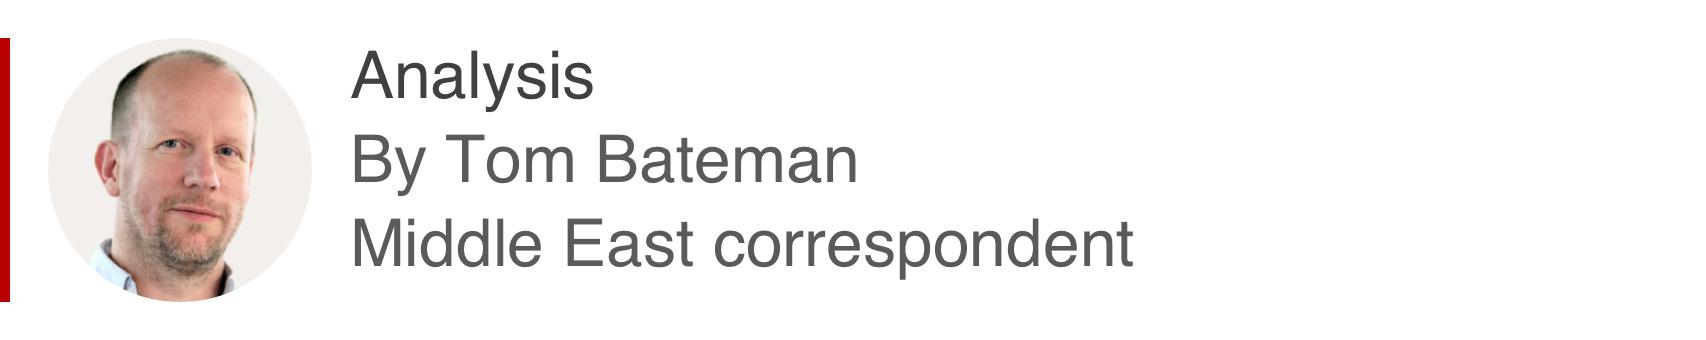 Analysis box by Tom Bateman, Middle East correspondent